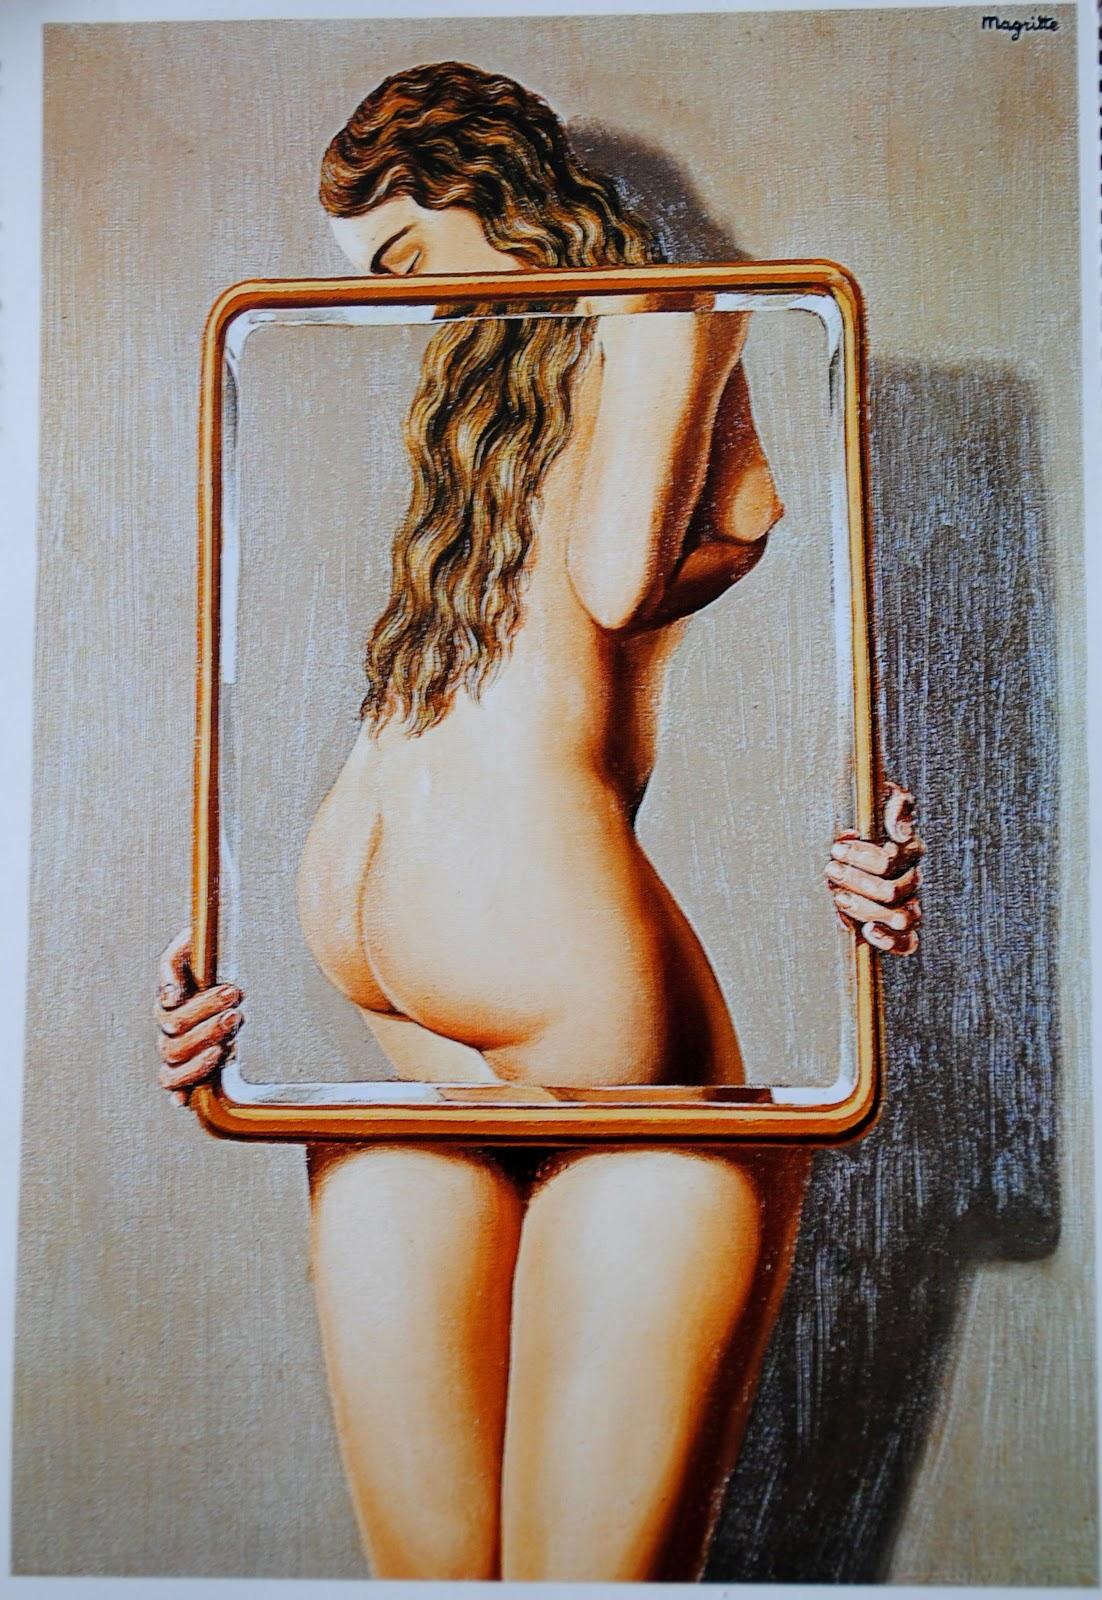 obraz nagiej kobiety